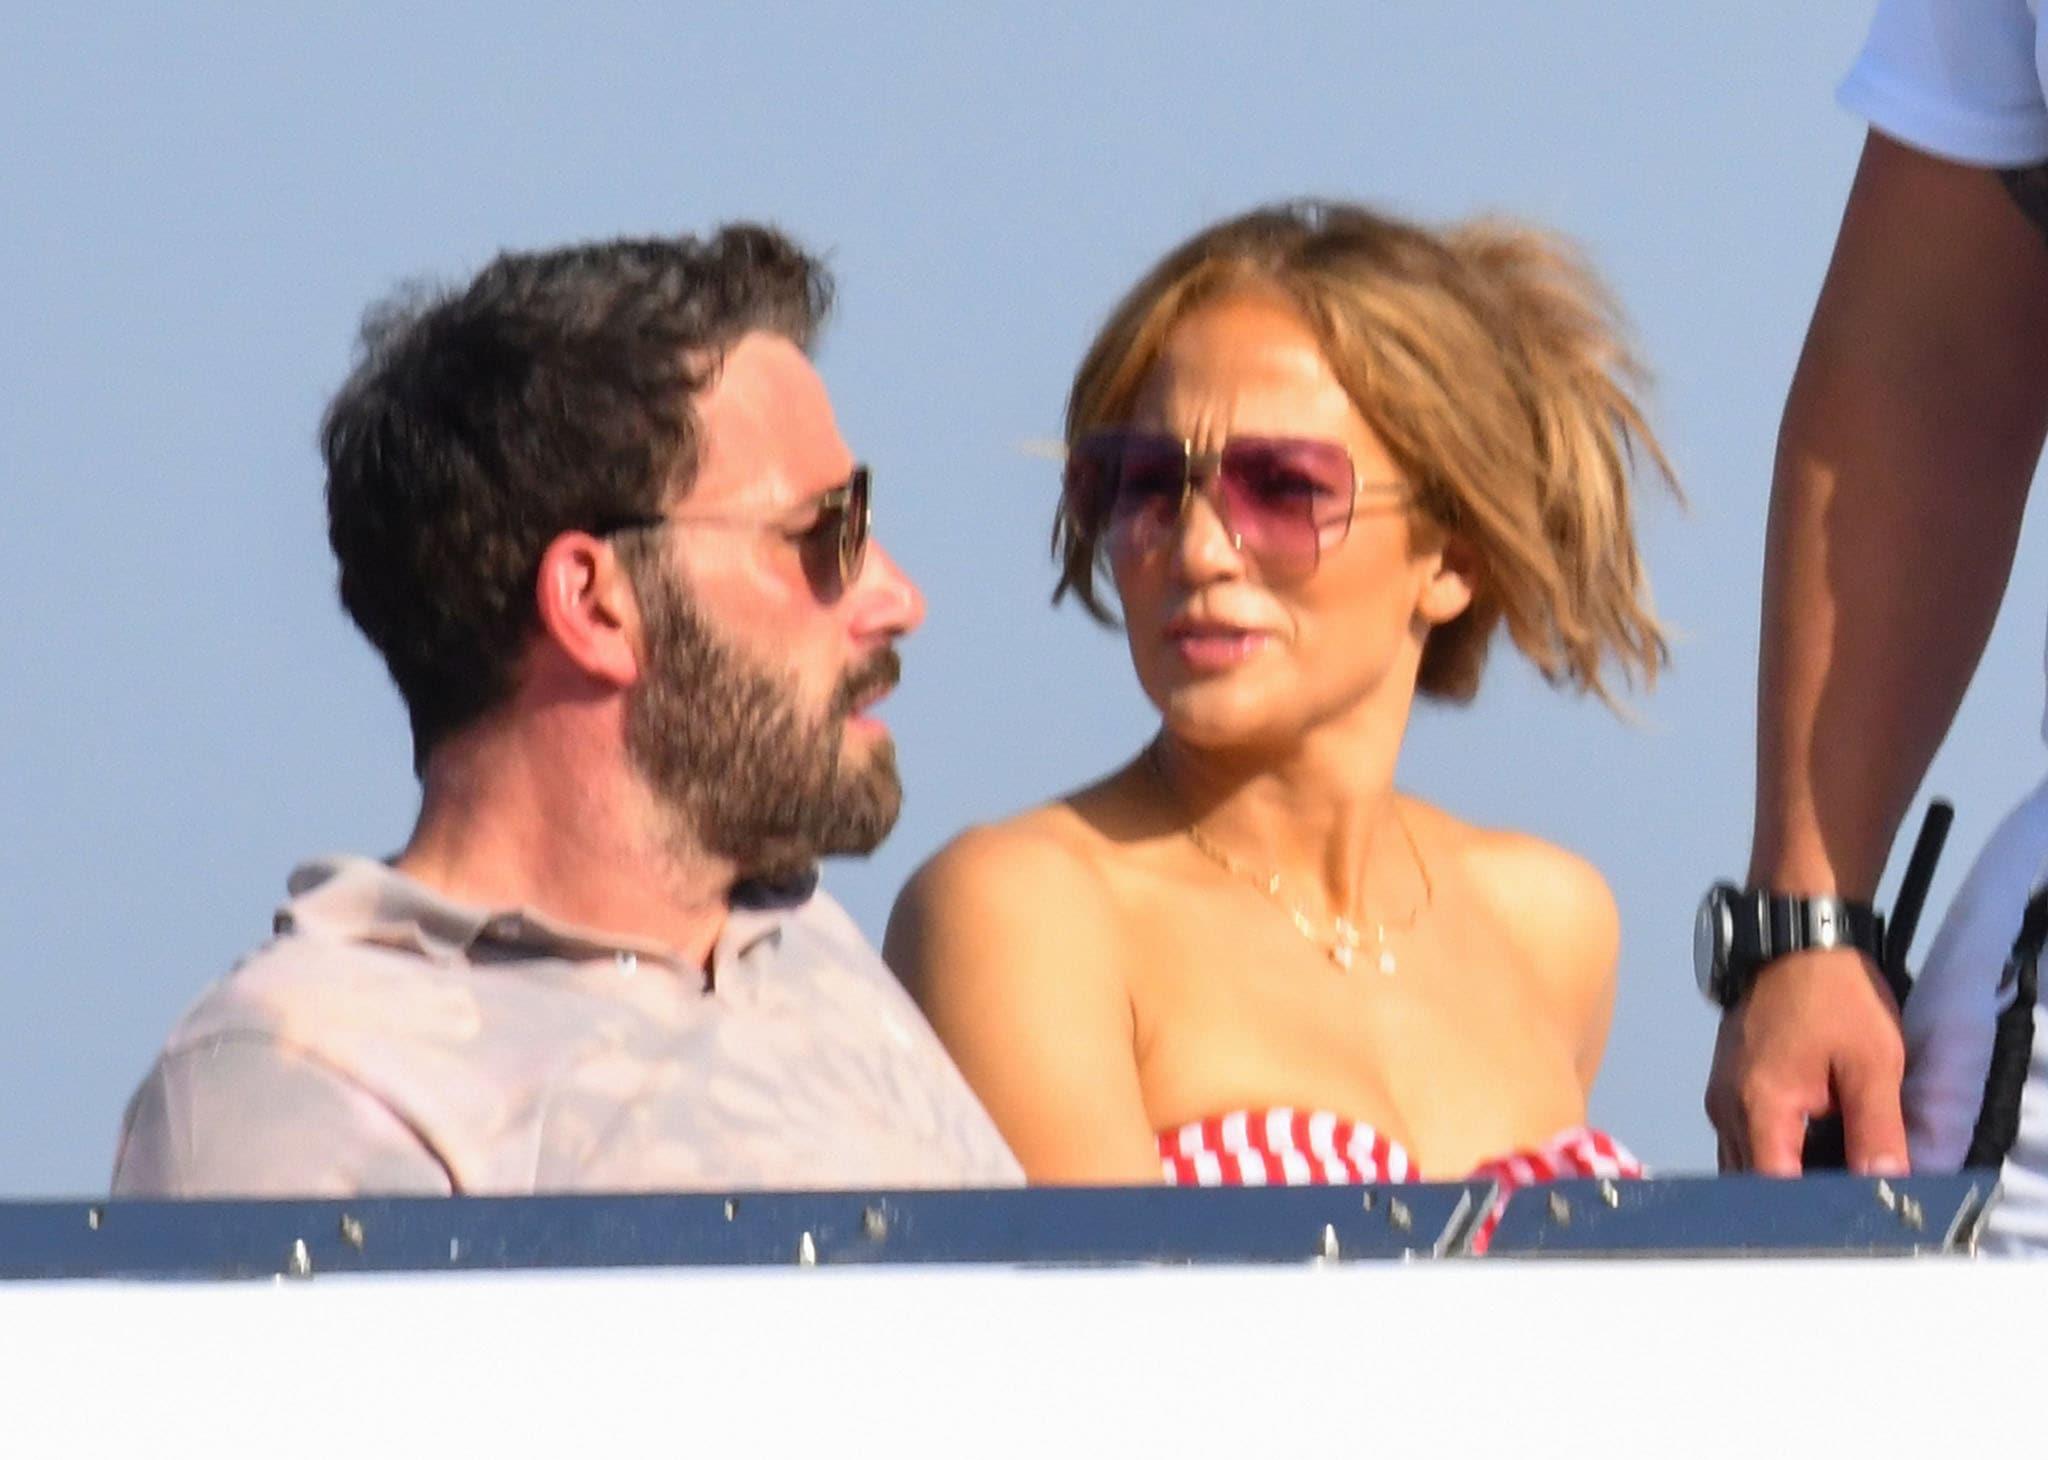 Jennifer Lopez and Ben Affleck cruising around Amalfi coast on board the Valerie yacht on July 28, 2021